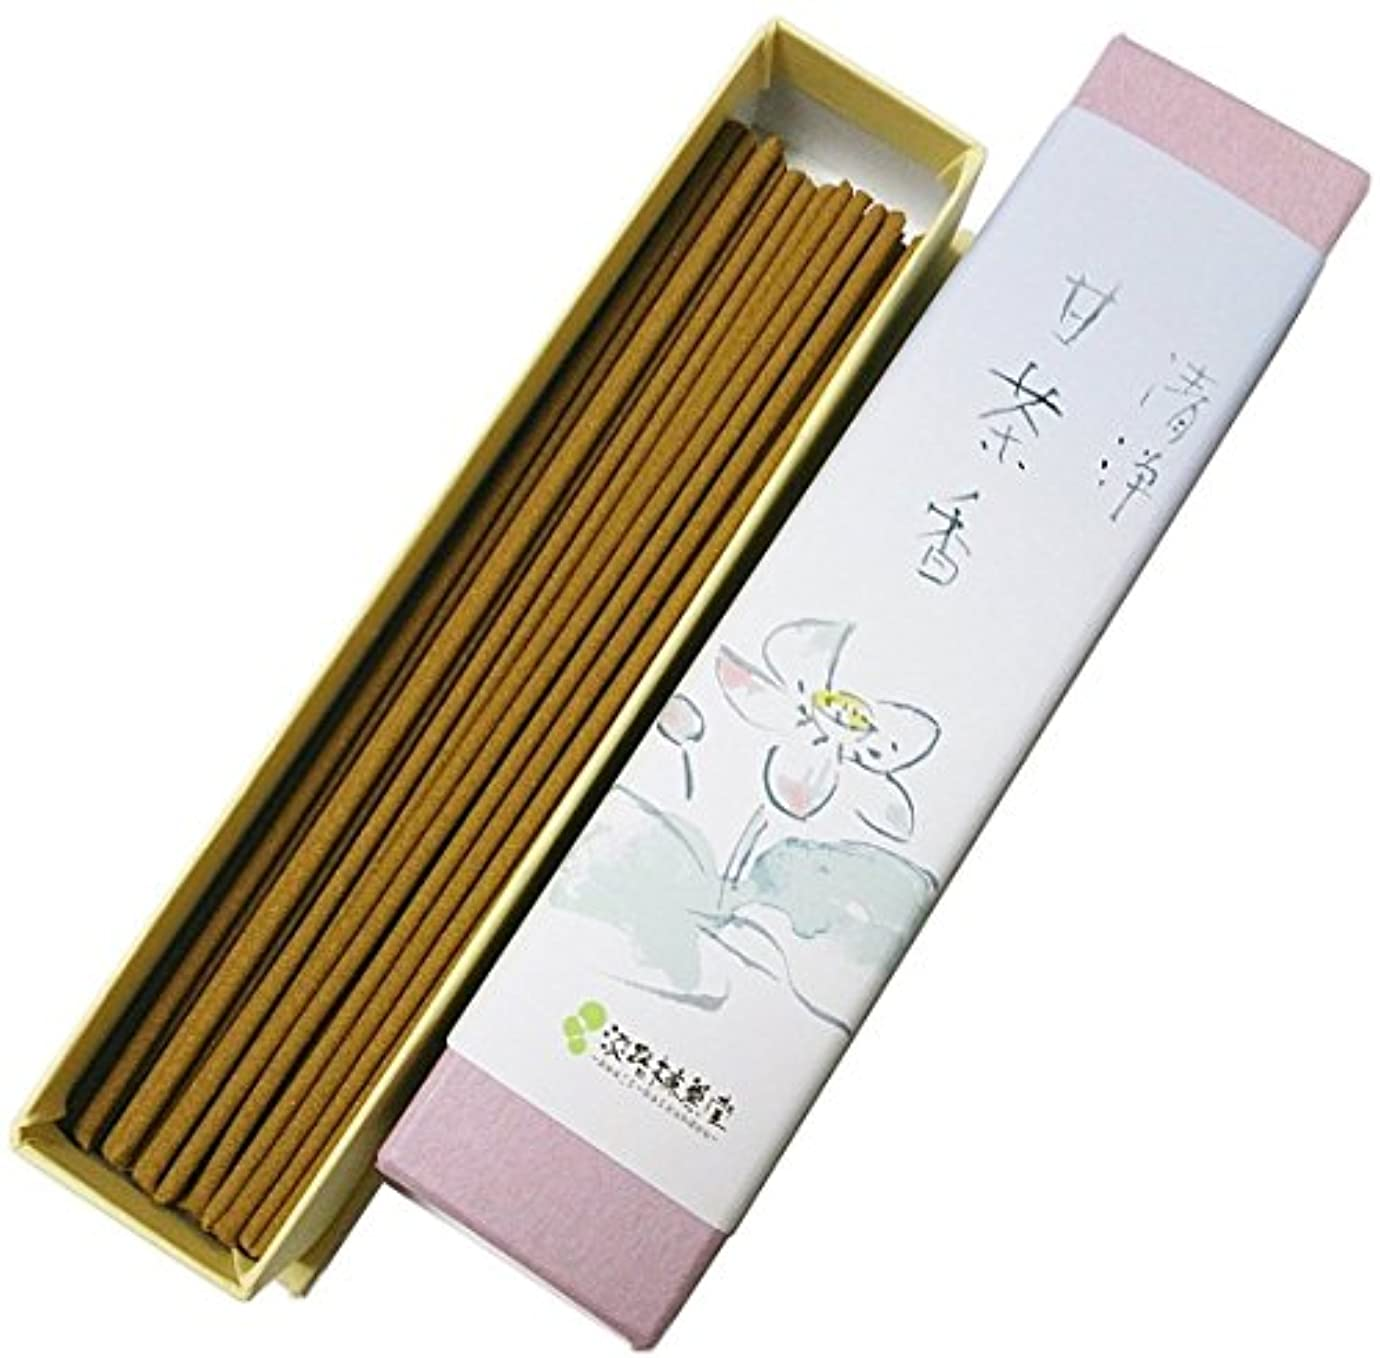 閉塞設計図雰囲気淡路梅薫堂の浄化お香 清浄甘茶香 18g #31 ×200 japanese incense sticks